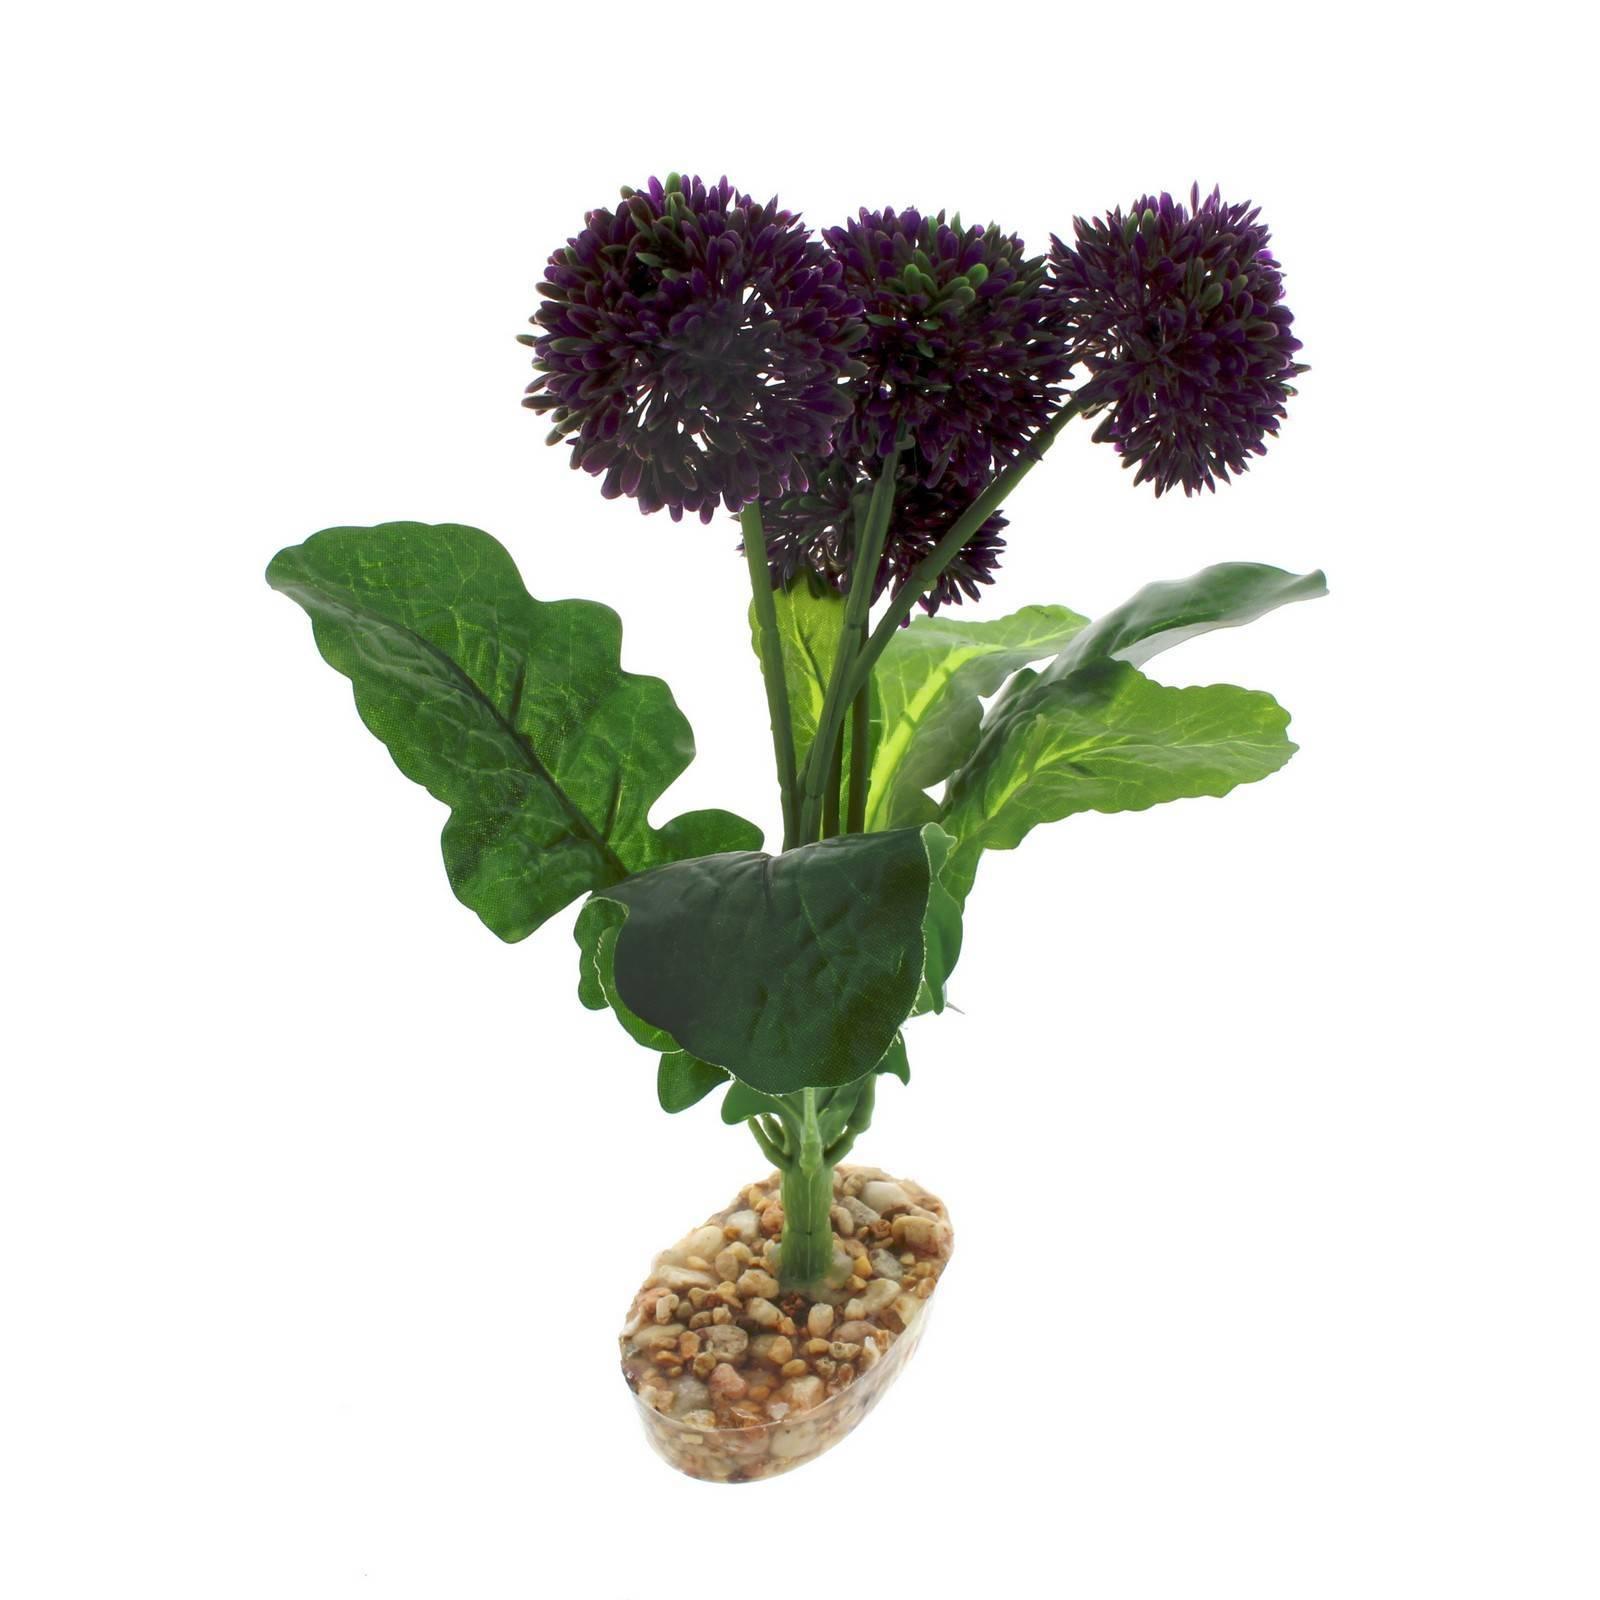 Reptile Plant Purple Pom Pom With Gravel Base Realistic Silk